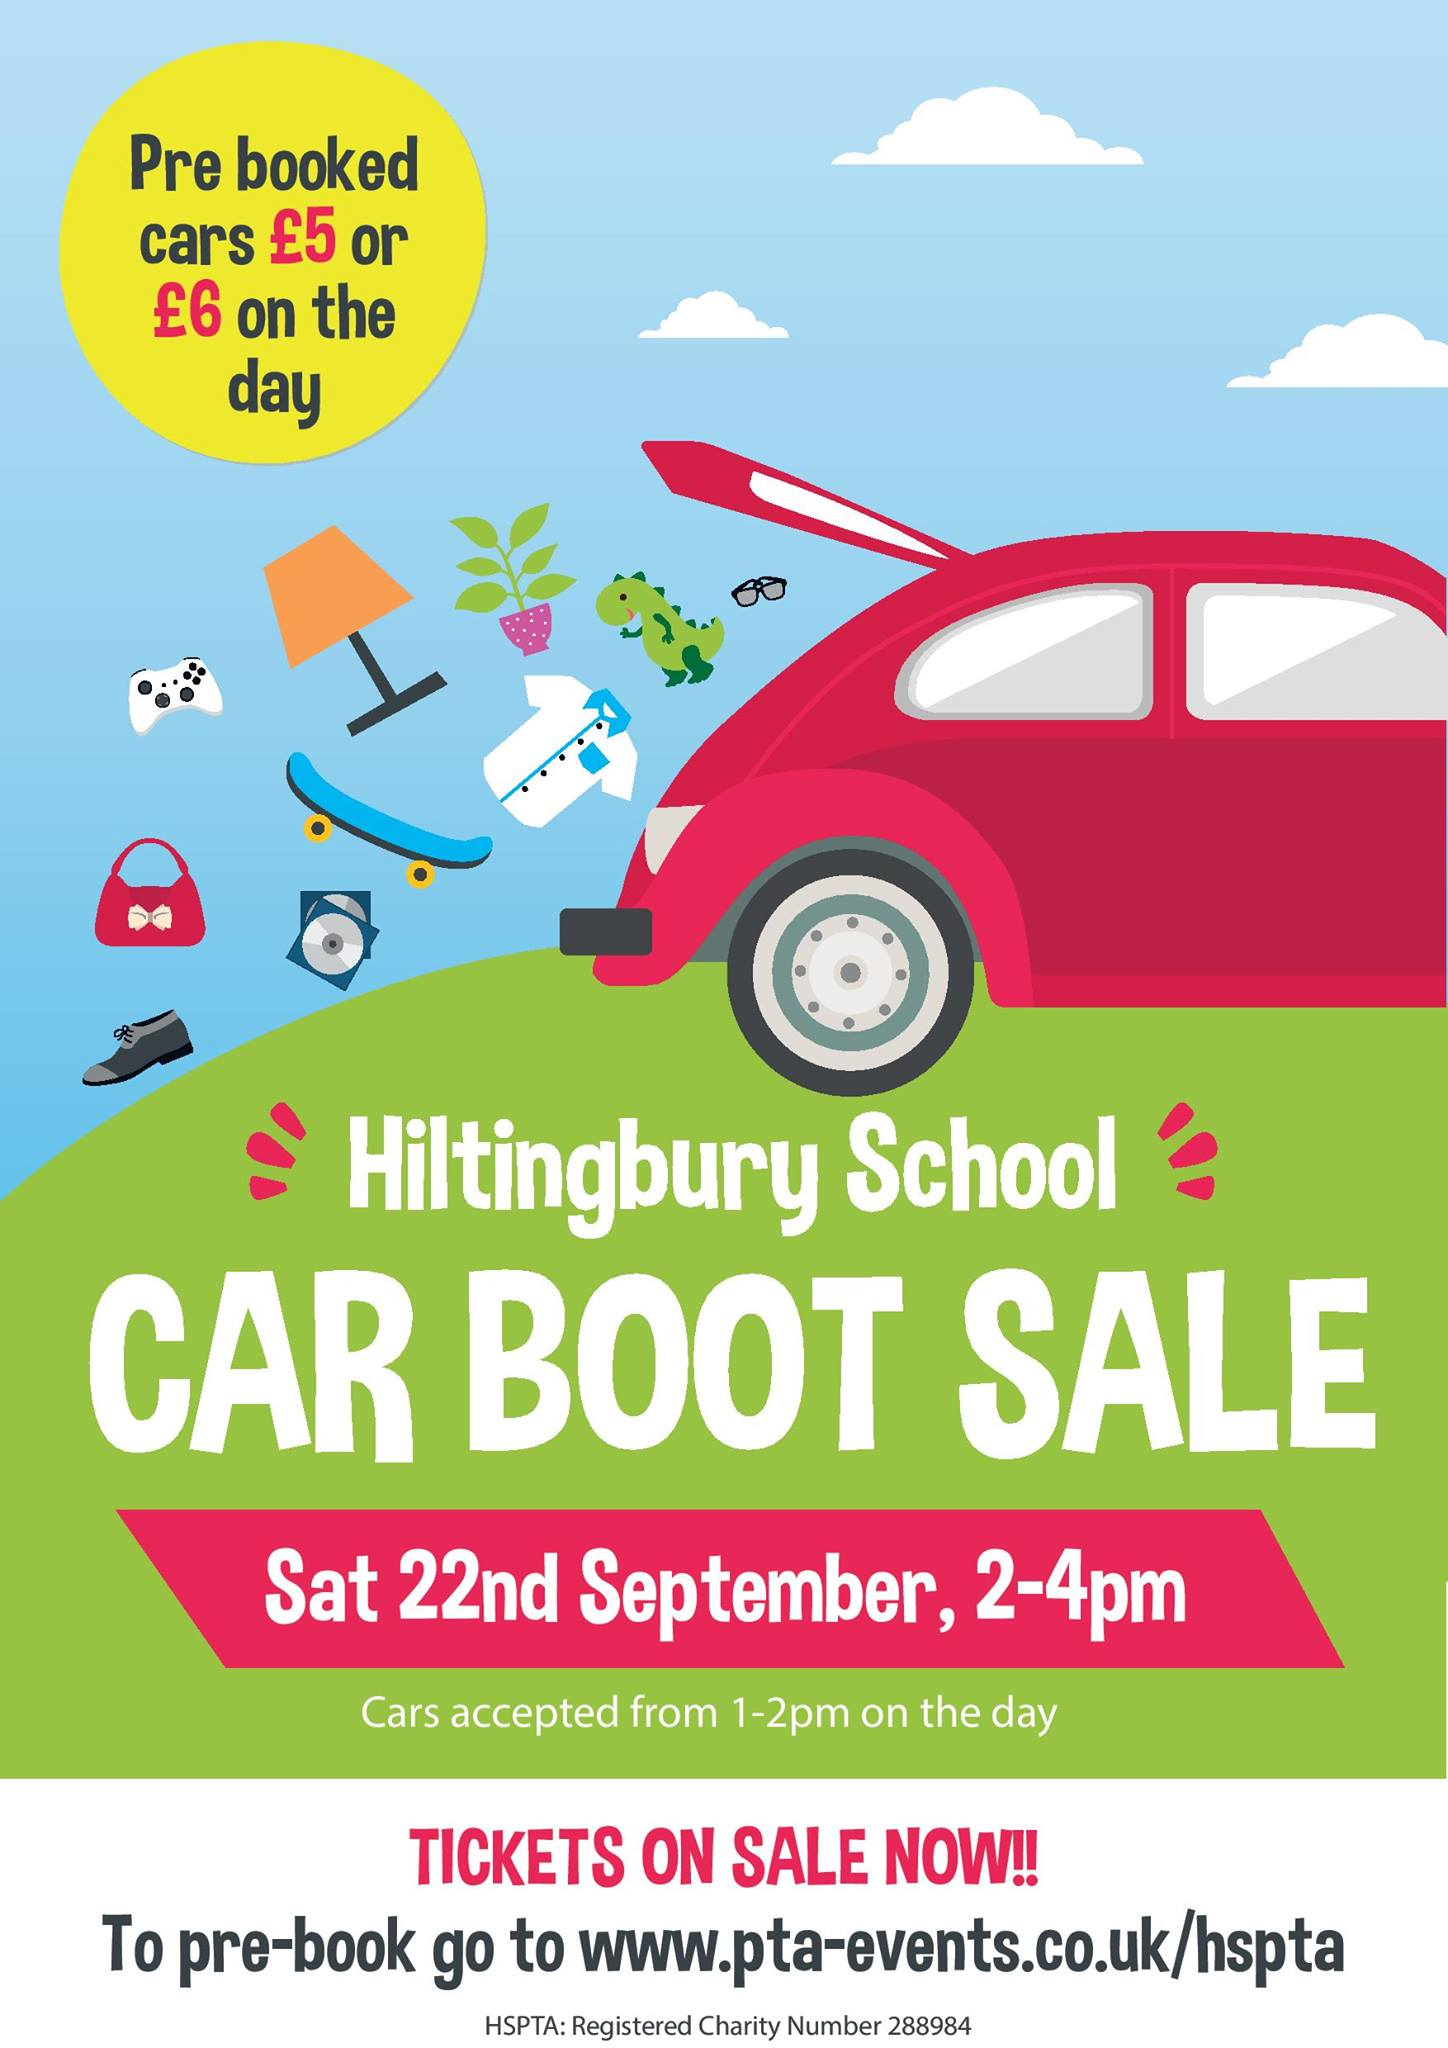 Hiltingbury school car boot sale